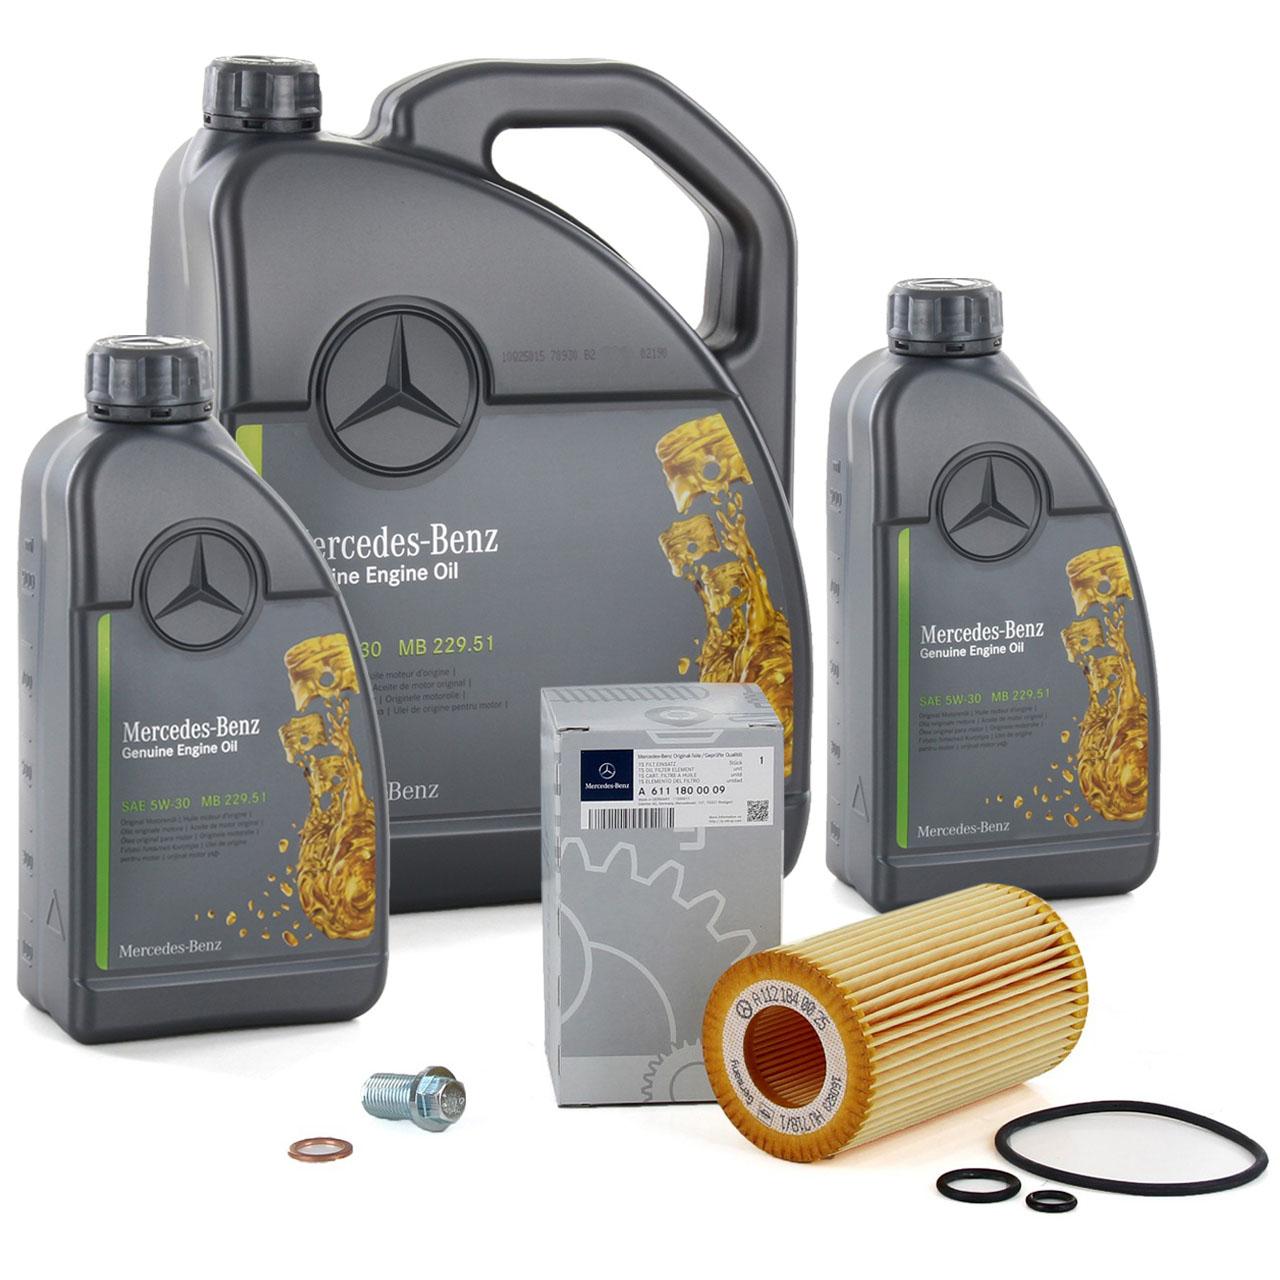 7 Liter ORIGINAL Mercedes-Benz Motoröl 5W30 MB 229.51 + Ölfilter 6111800009